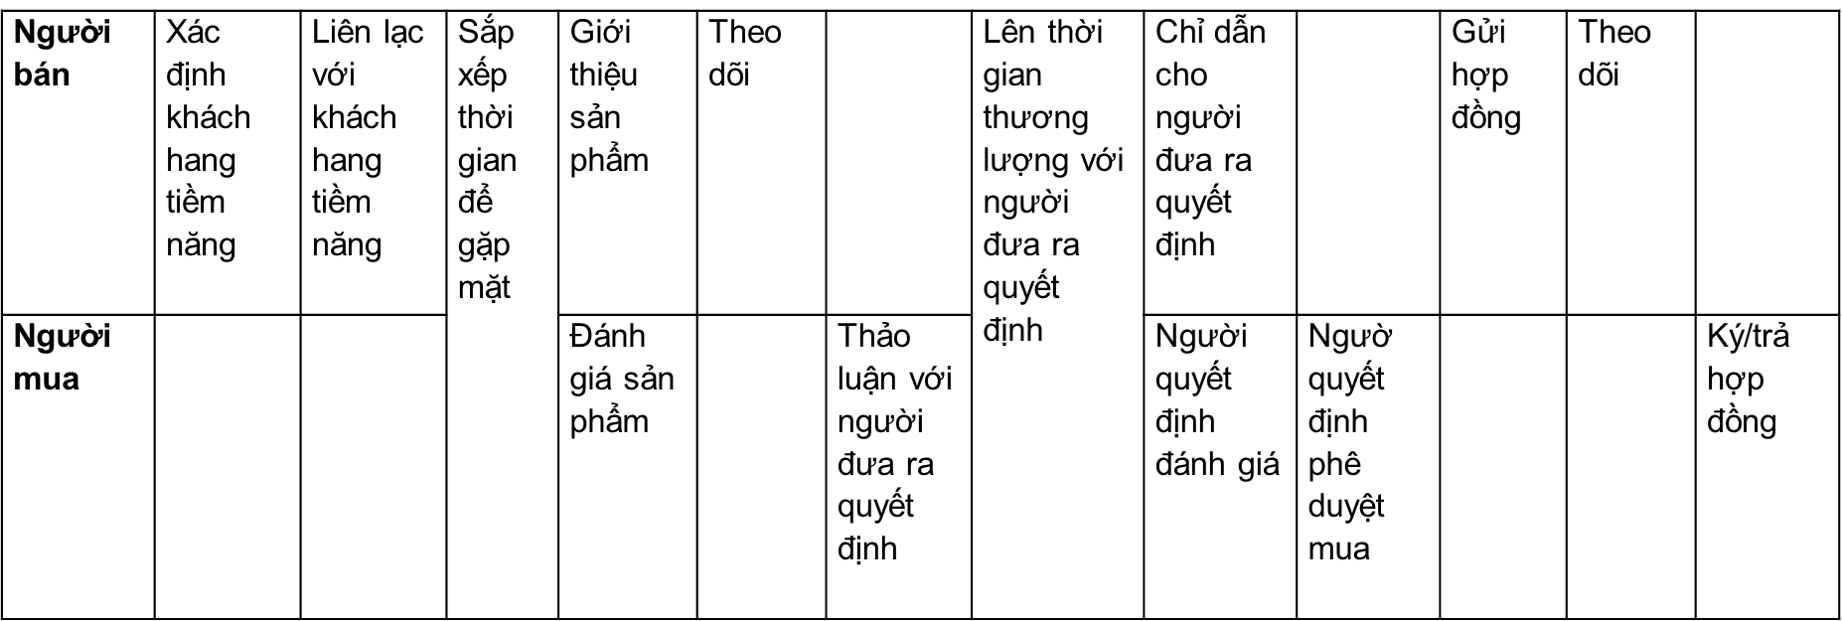 Thiet-ke-quy-trinh-ban-hang-cua-doanh-nghiep-trong-HubSpot-02-1